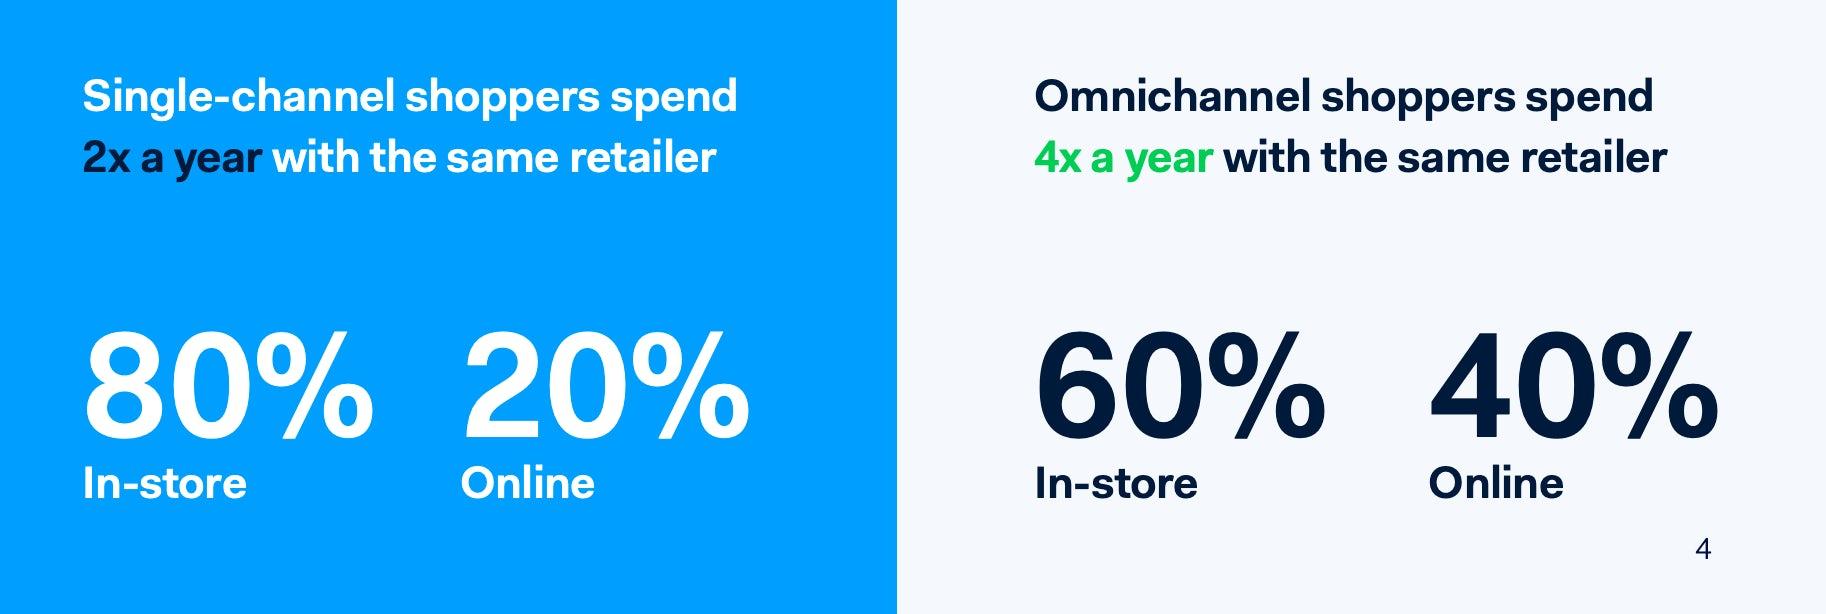 omni-channel stat